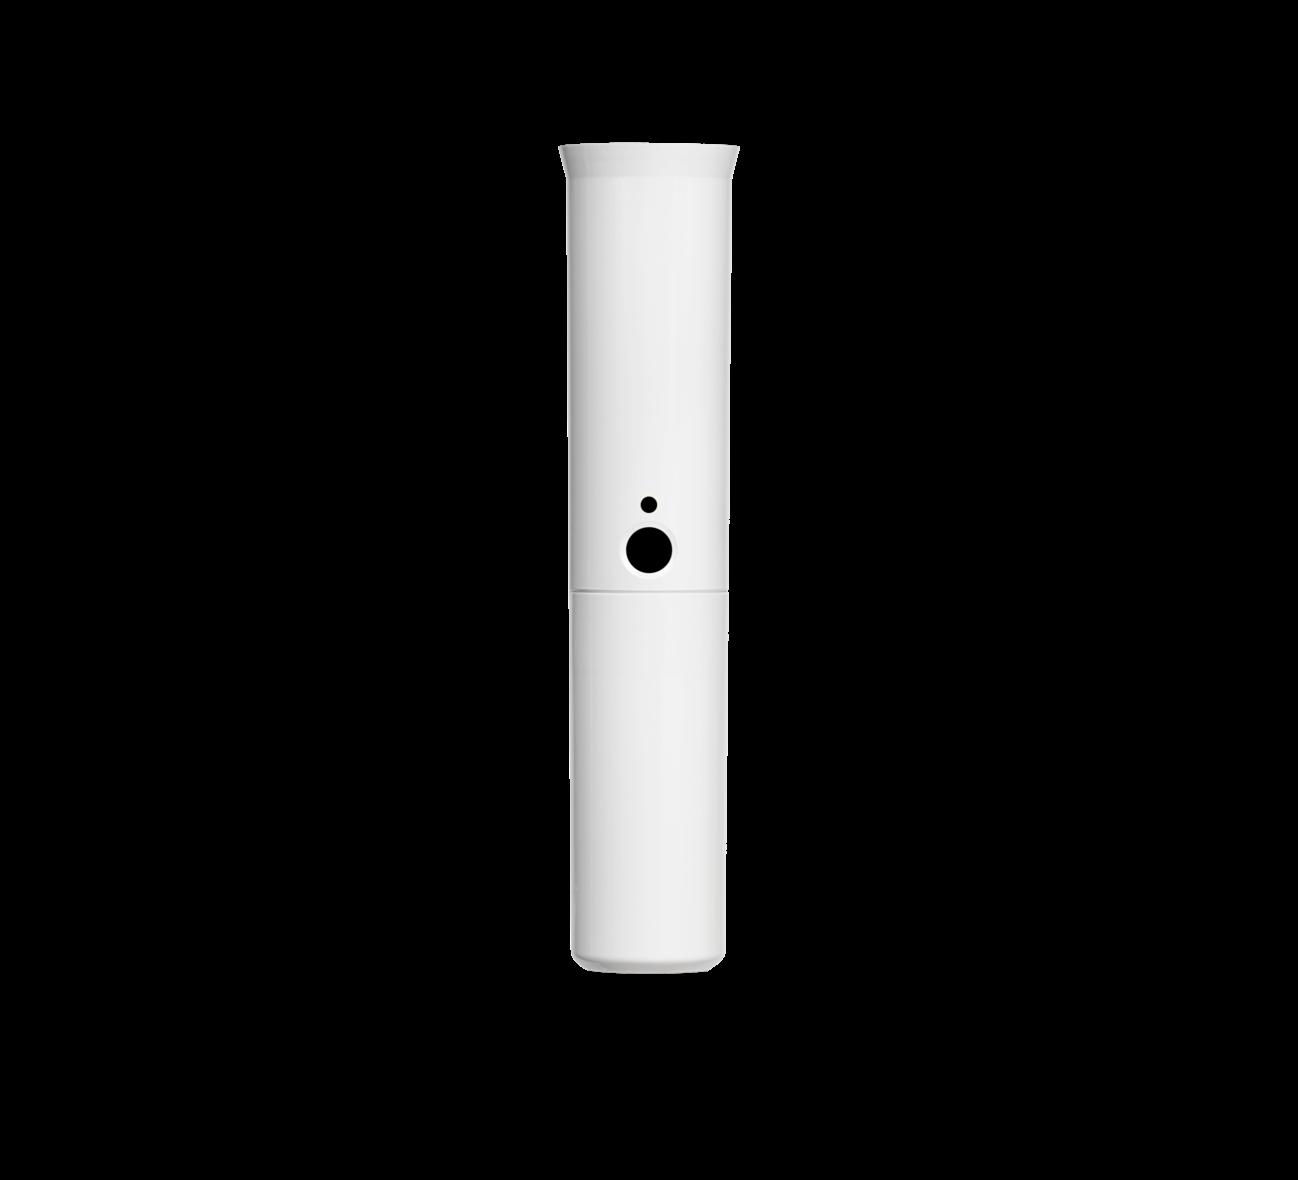 Shure WA712-WHT White Handle for BLX2/PG58 Handheld Transmitters